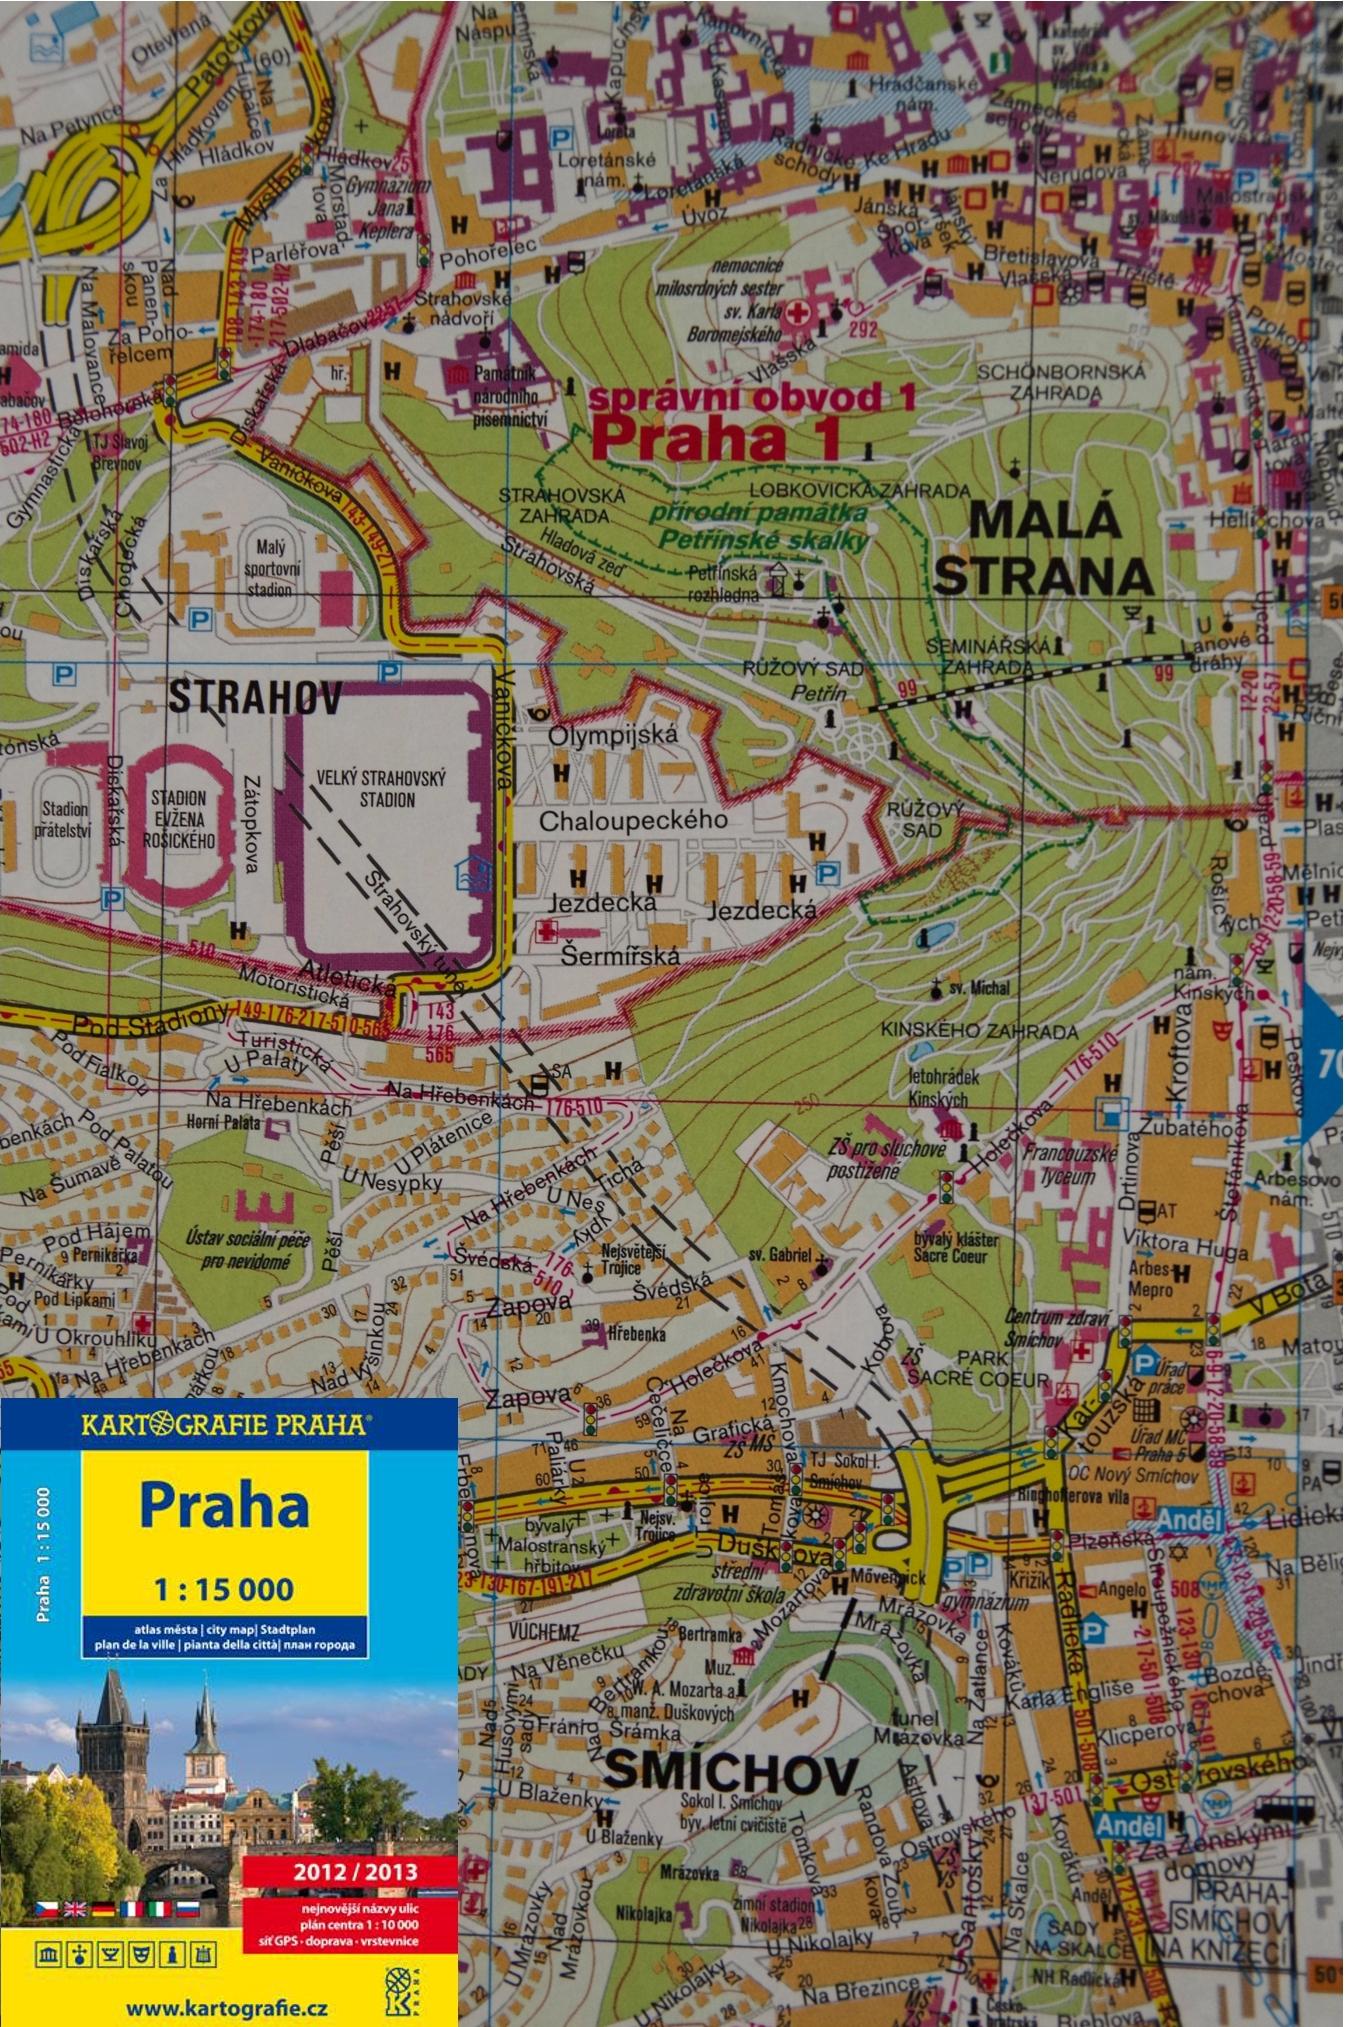 Praha ‒ Atlas města 1 : 15 000 – Kartografie PRAHA, a. s.